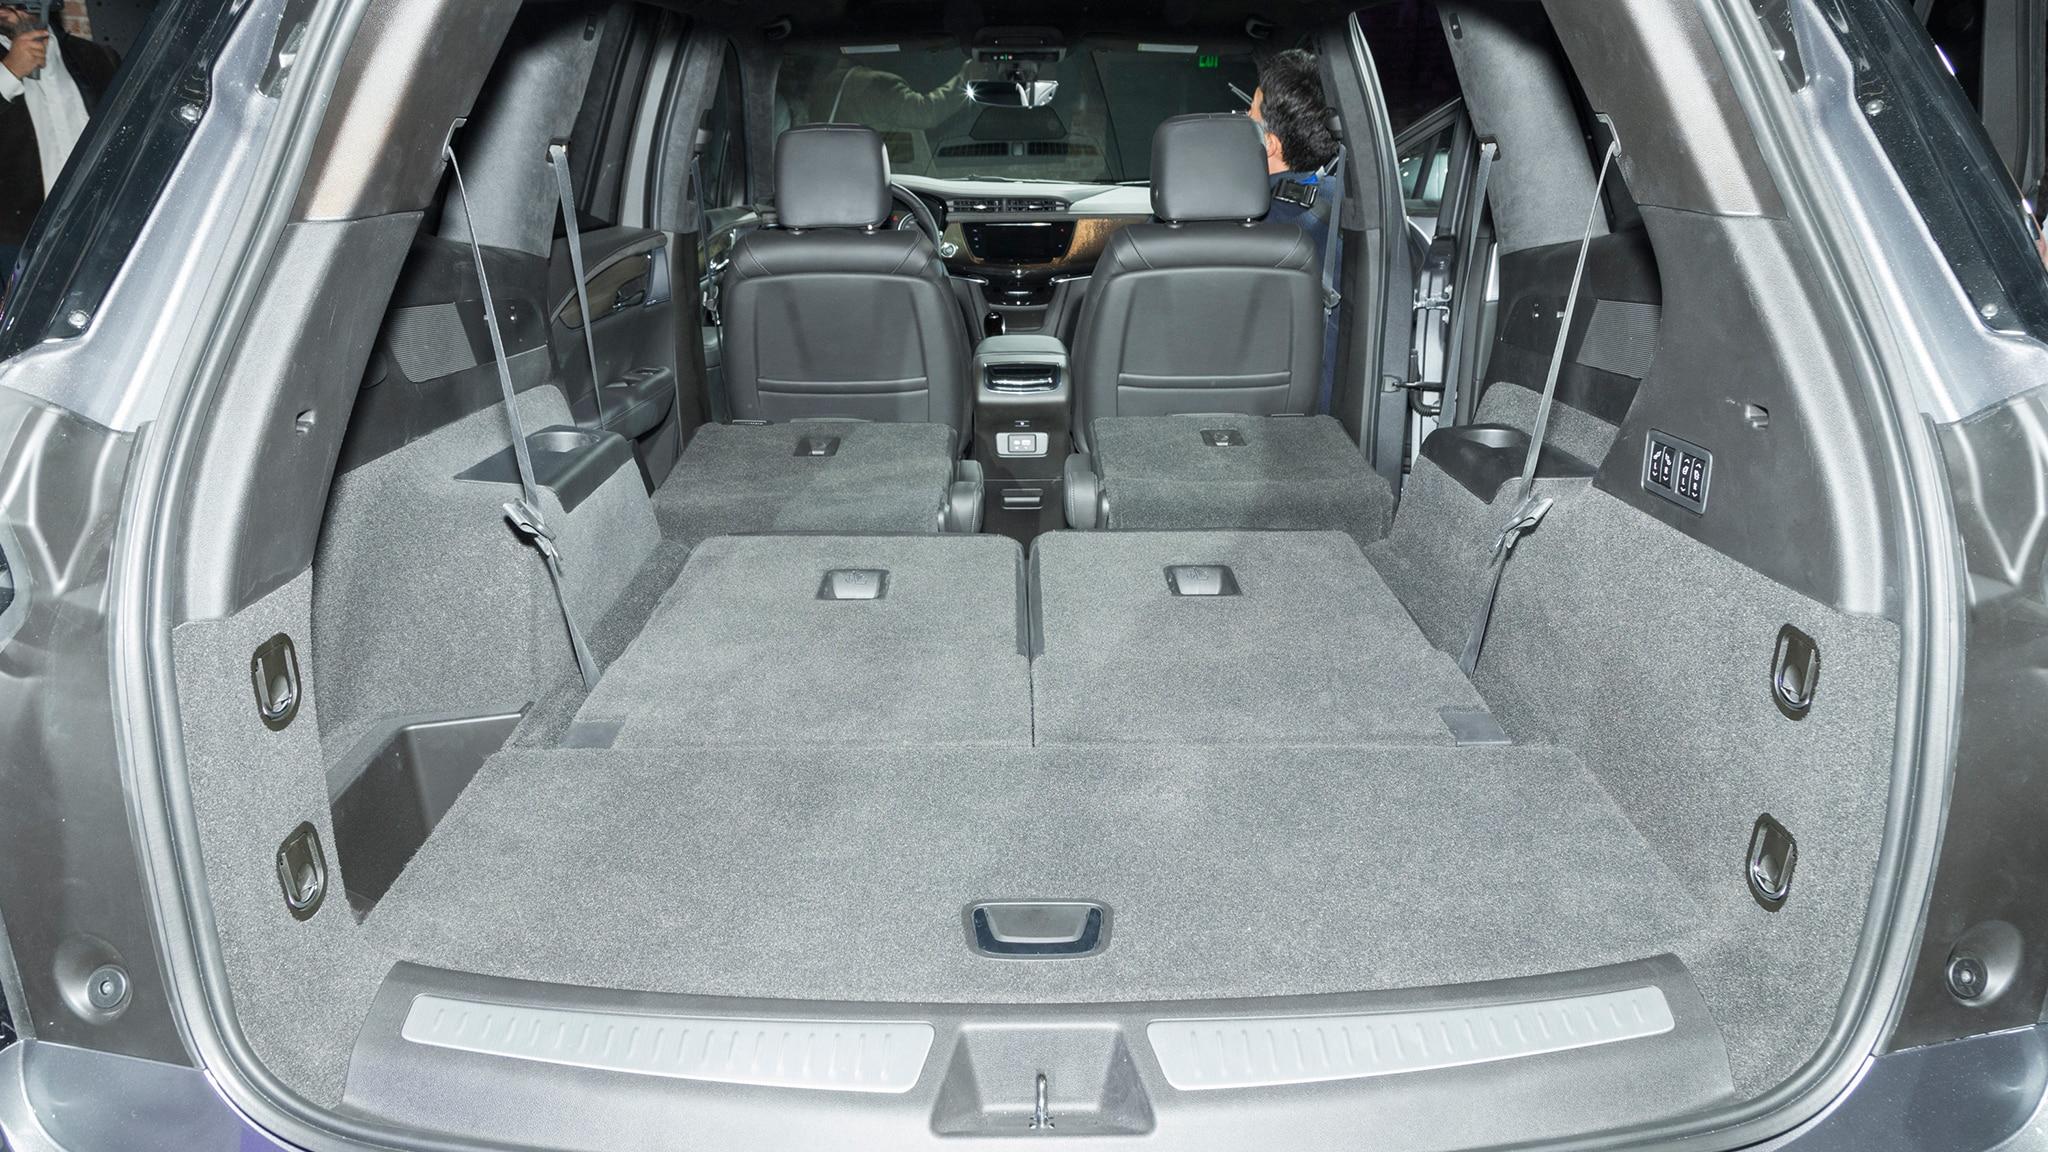 2020 Cadillac XT6: A More Genteel Three-Row Crossover SUV | Automobile Magazine